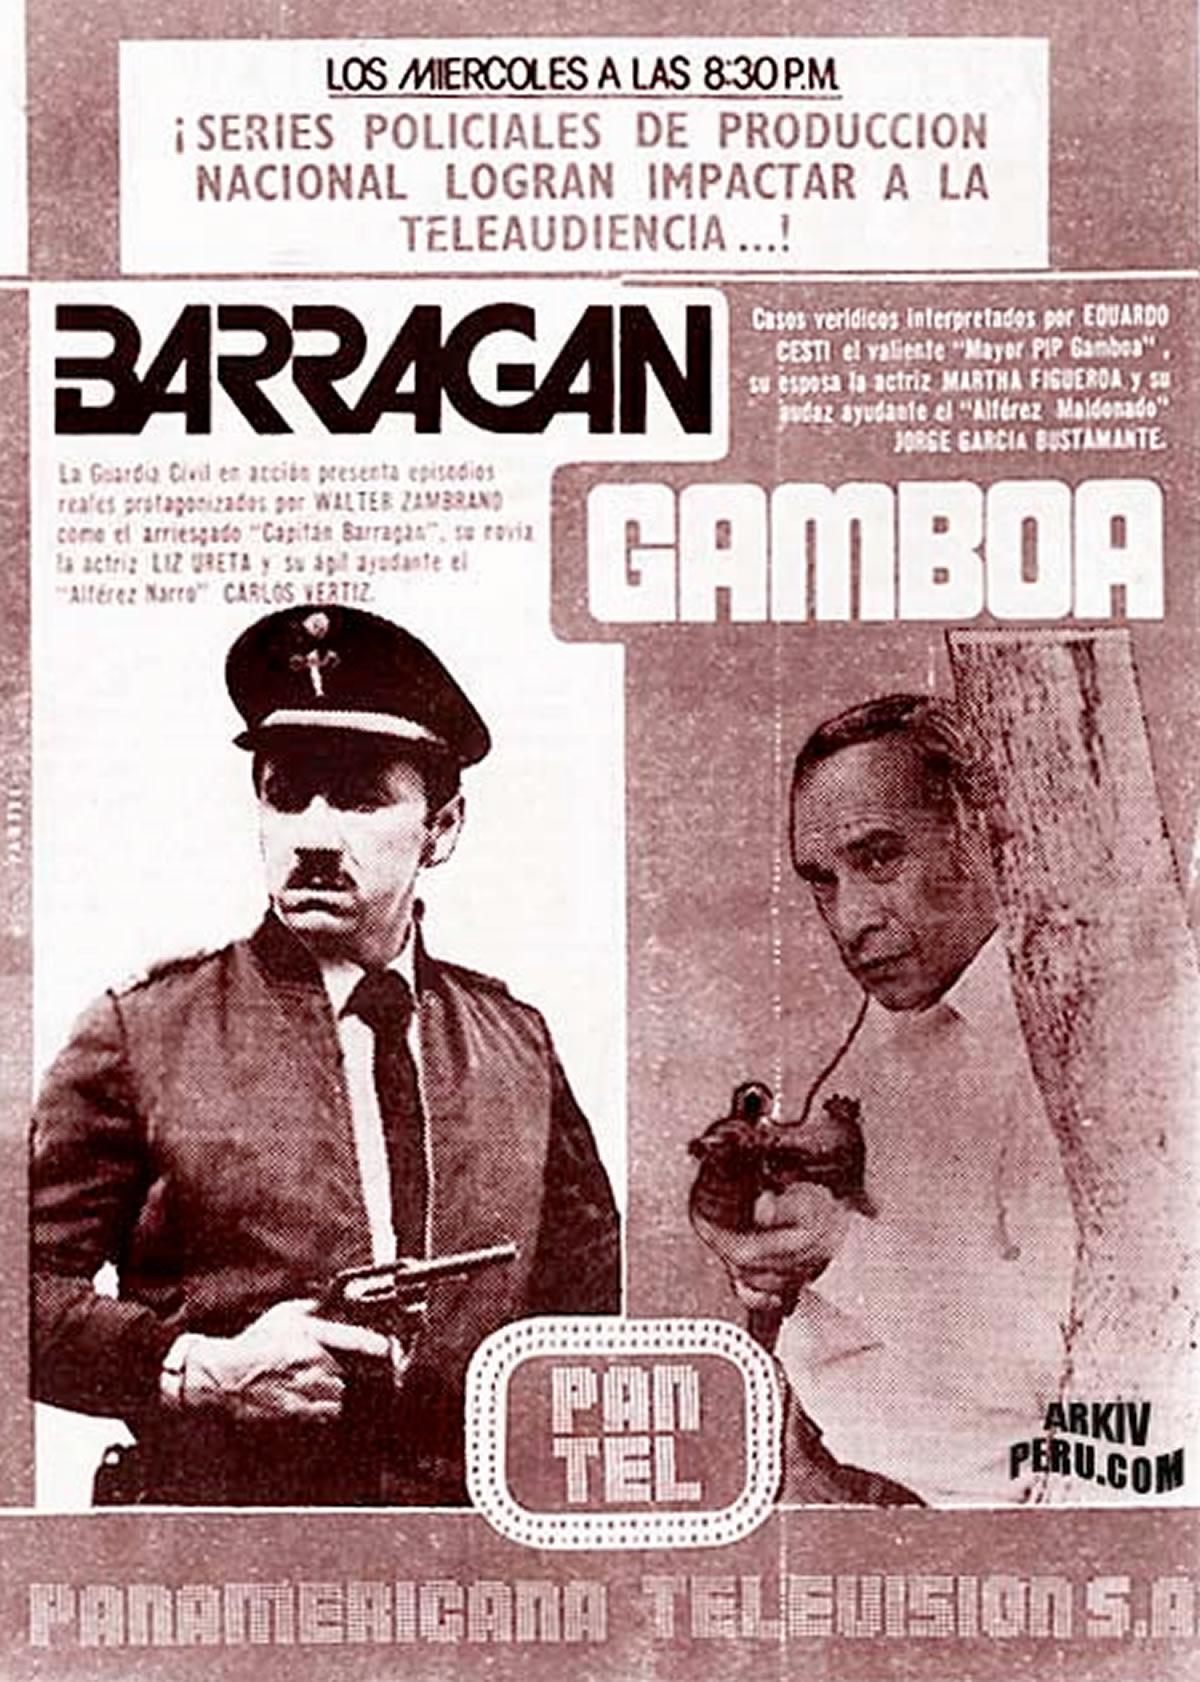 gamboa1